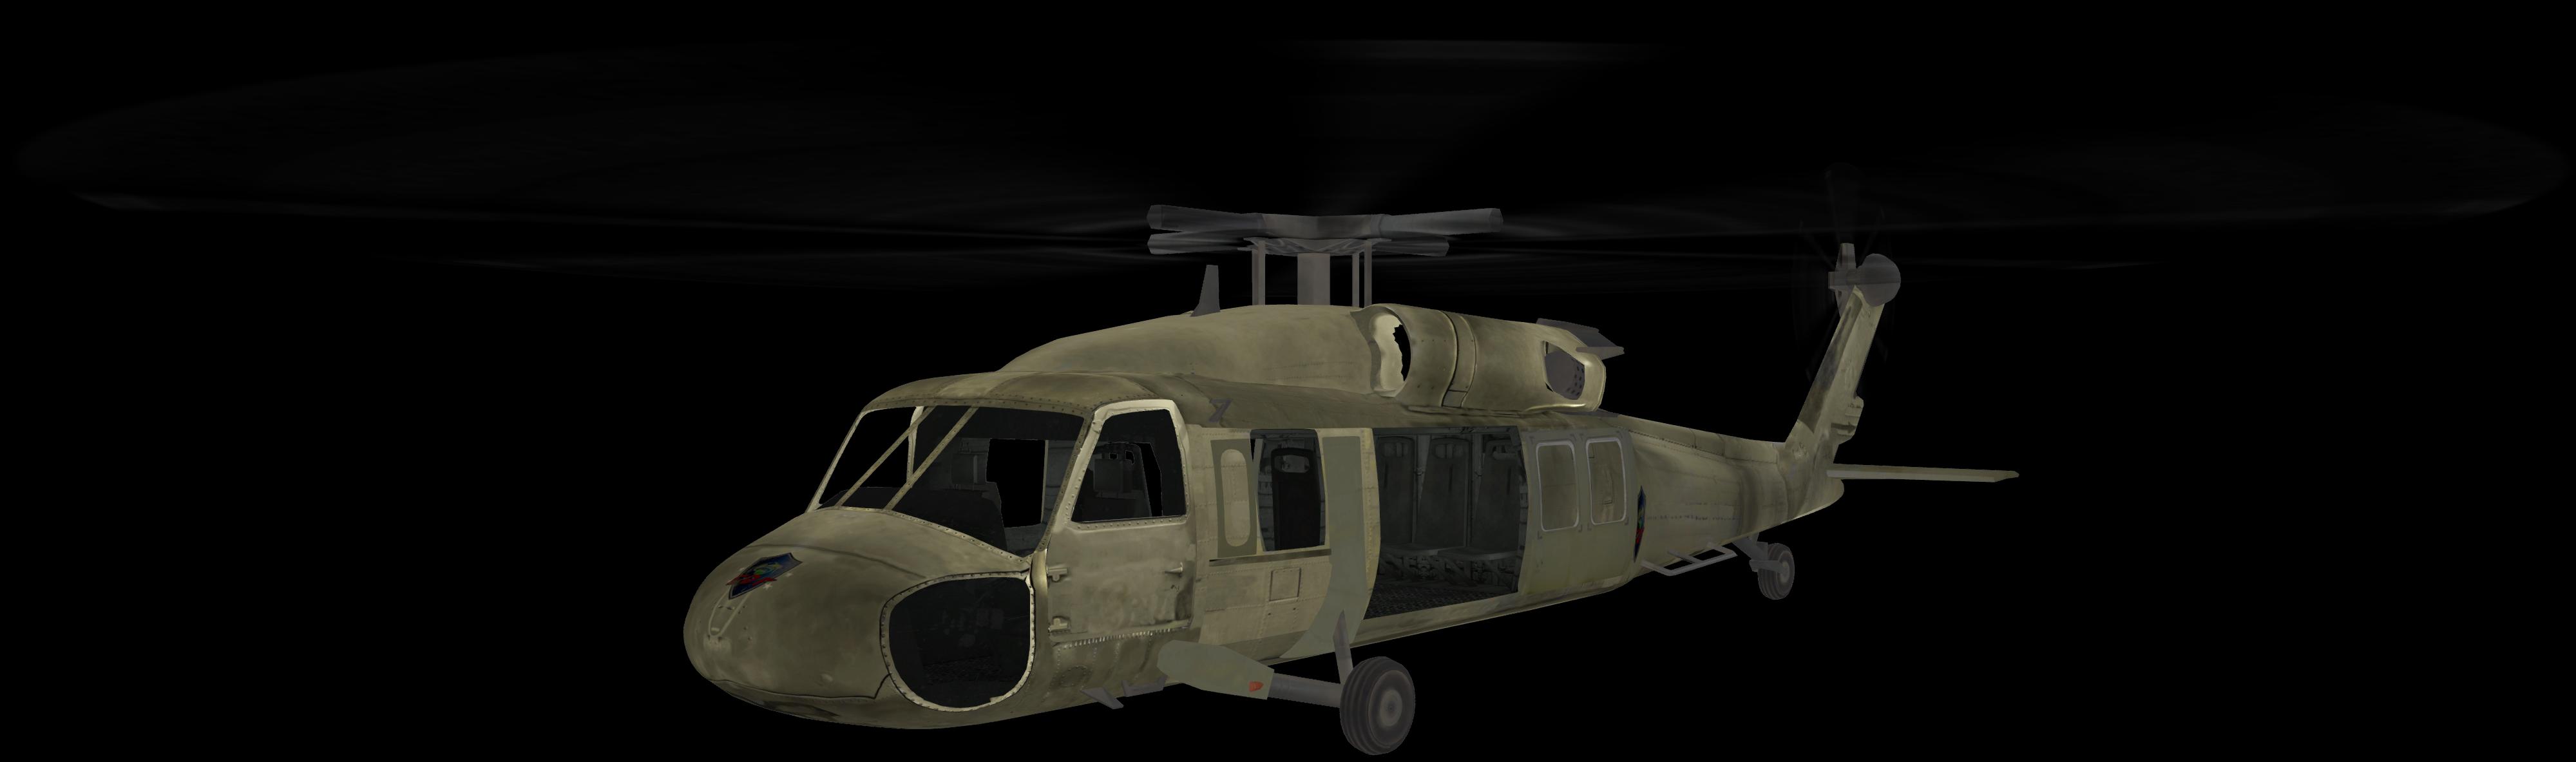 785ca02e5c0 UH-60 Black Hawk | Serious Sam Wiki | FANDOM powered by Wikia